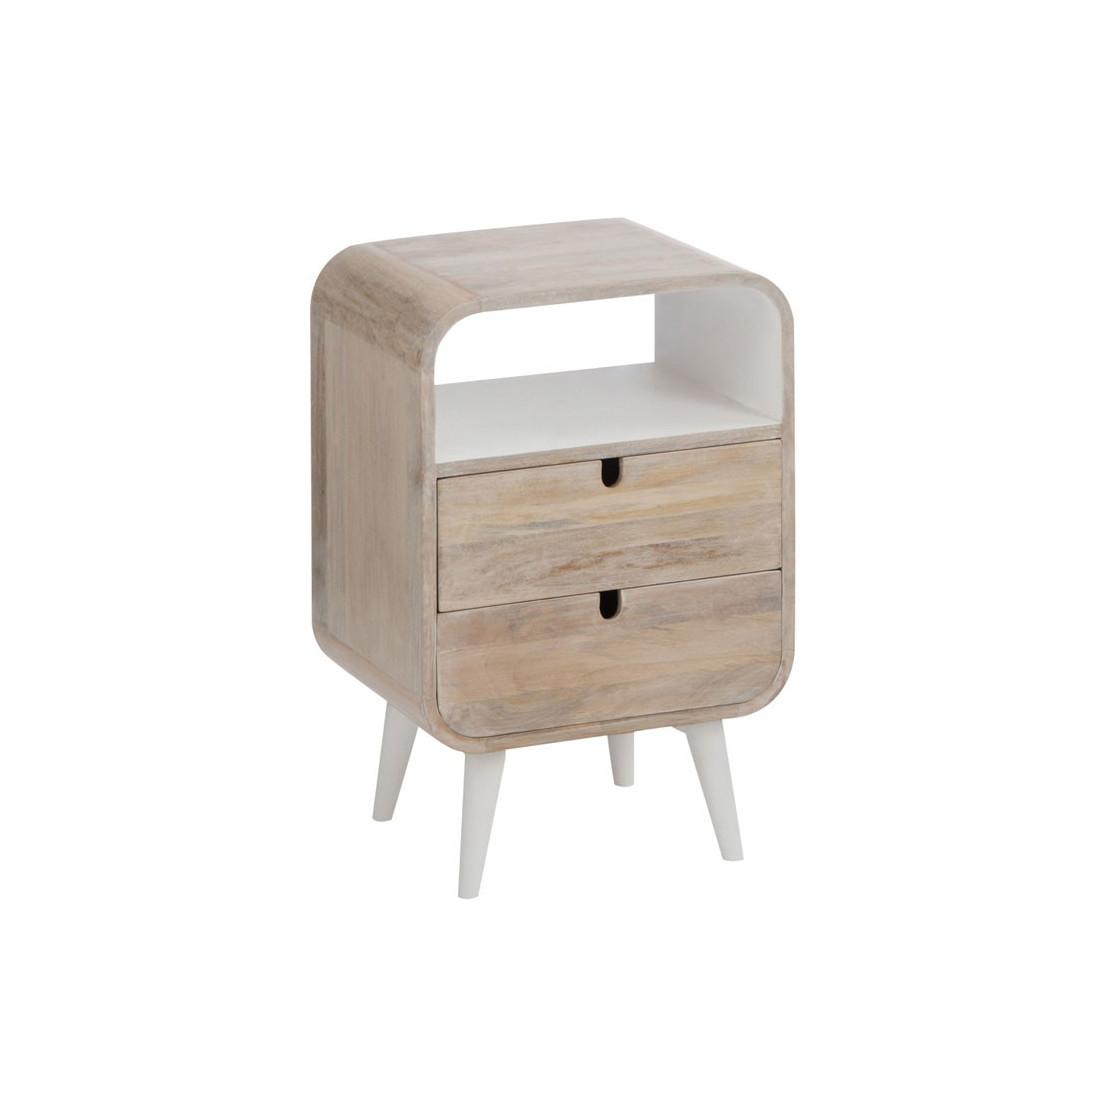 Table de chevet 2 tiroirs bois blanc metro univers de la - Table de chevet bois blanc ...